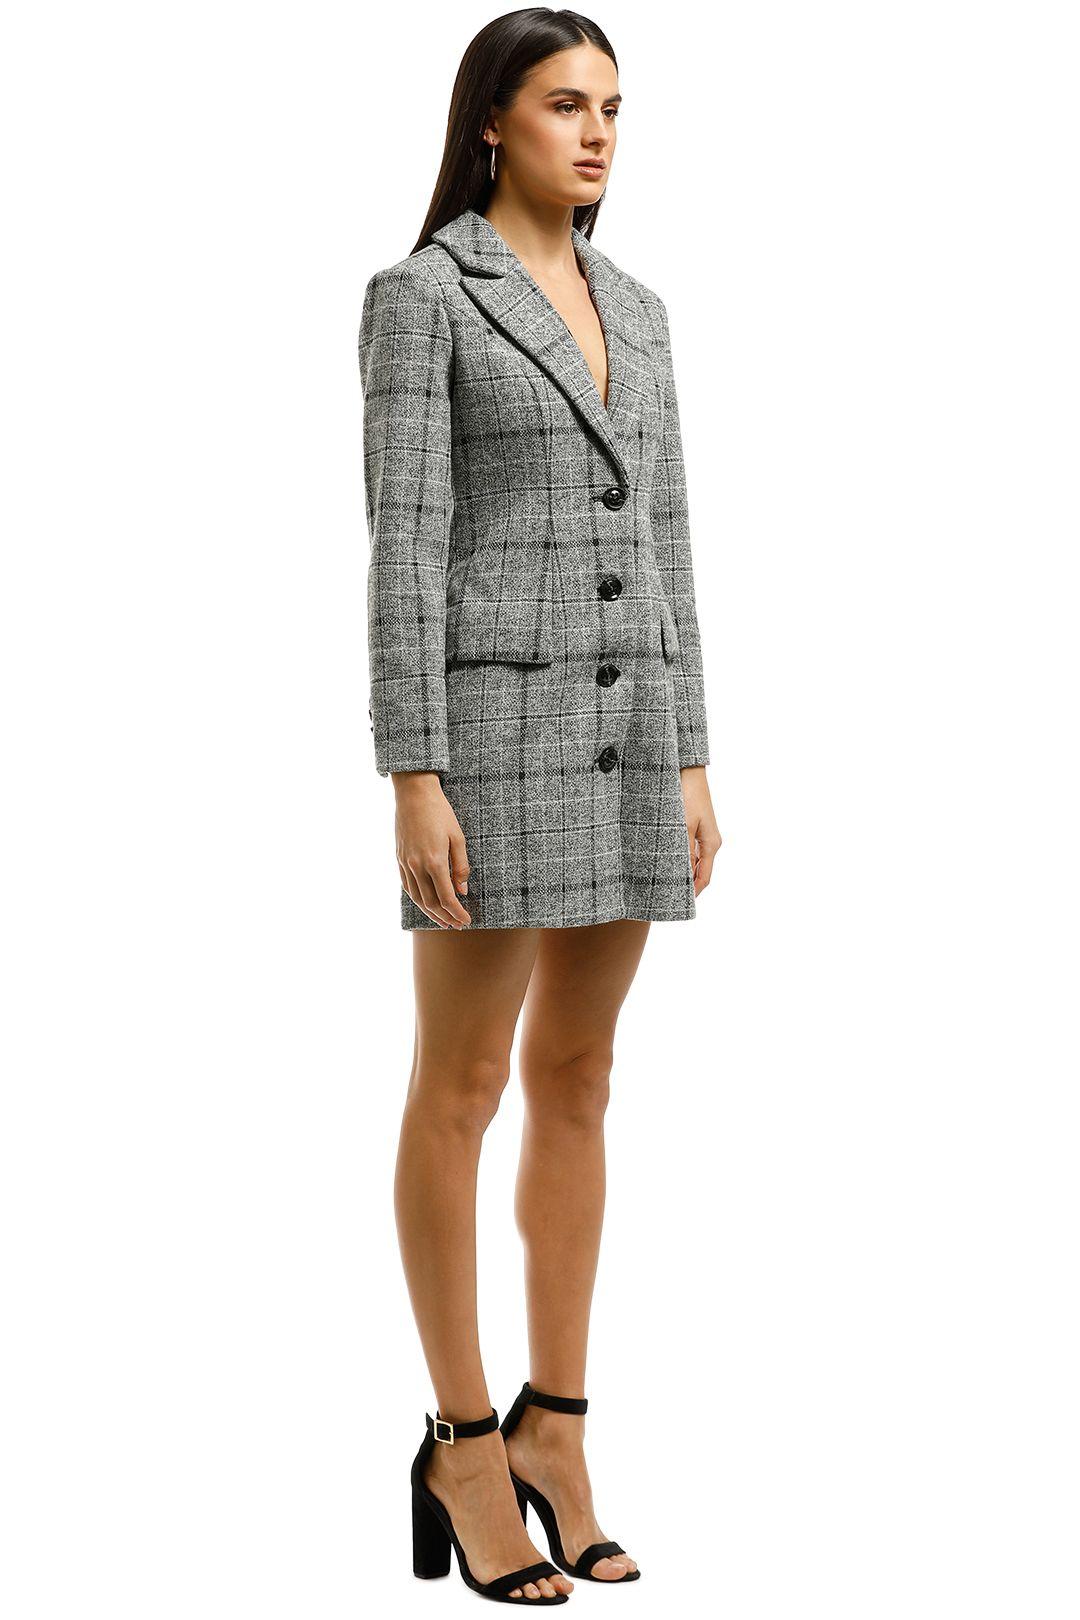 Elliatt-Prato Blazer Dress-Grey-Side